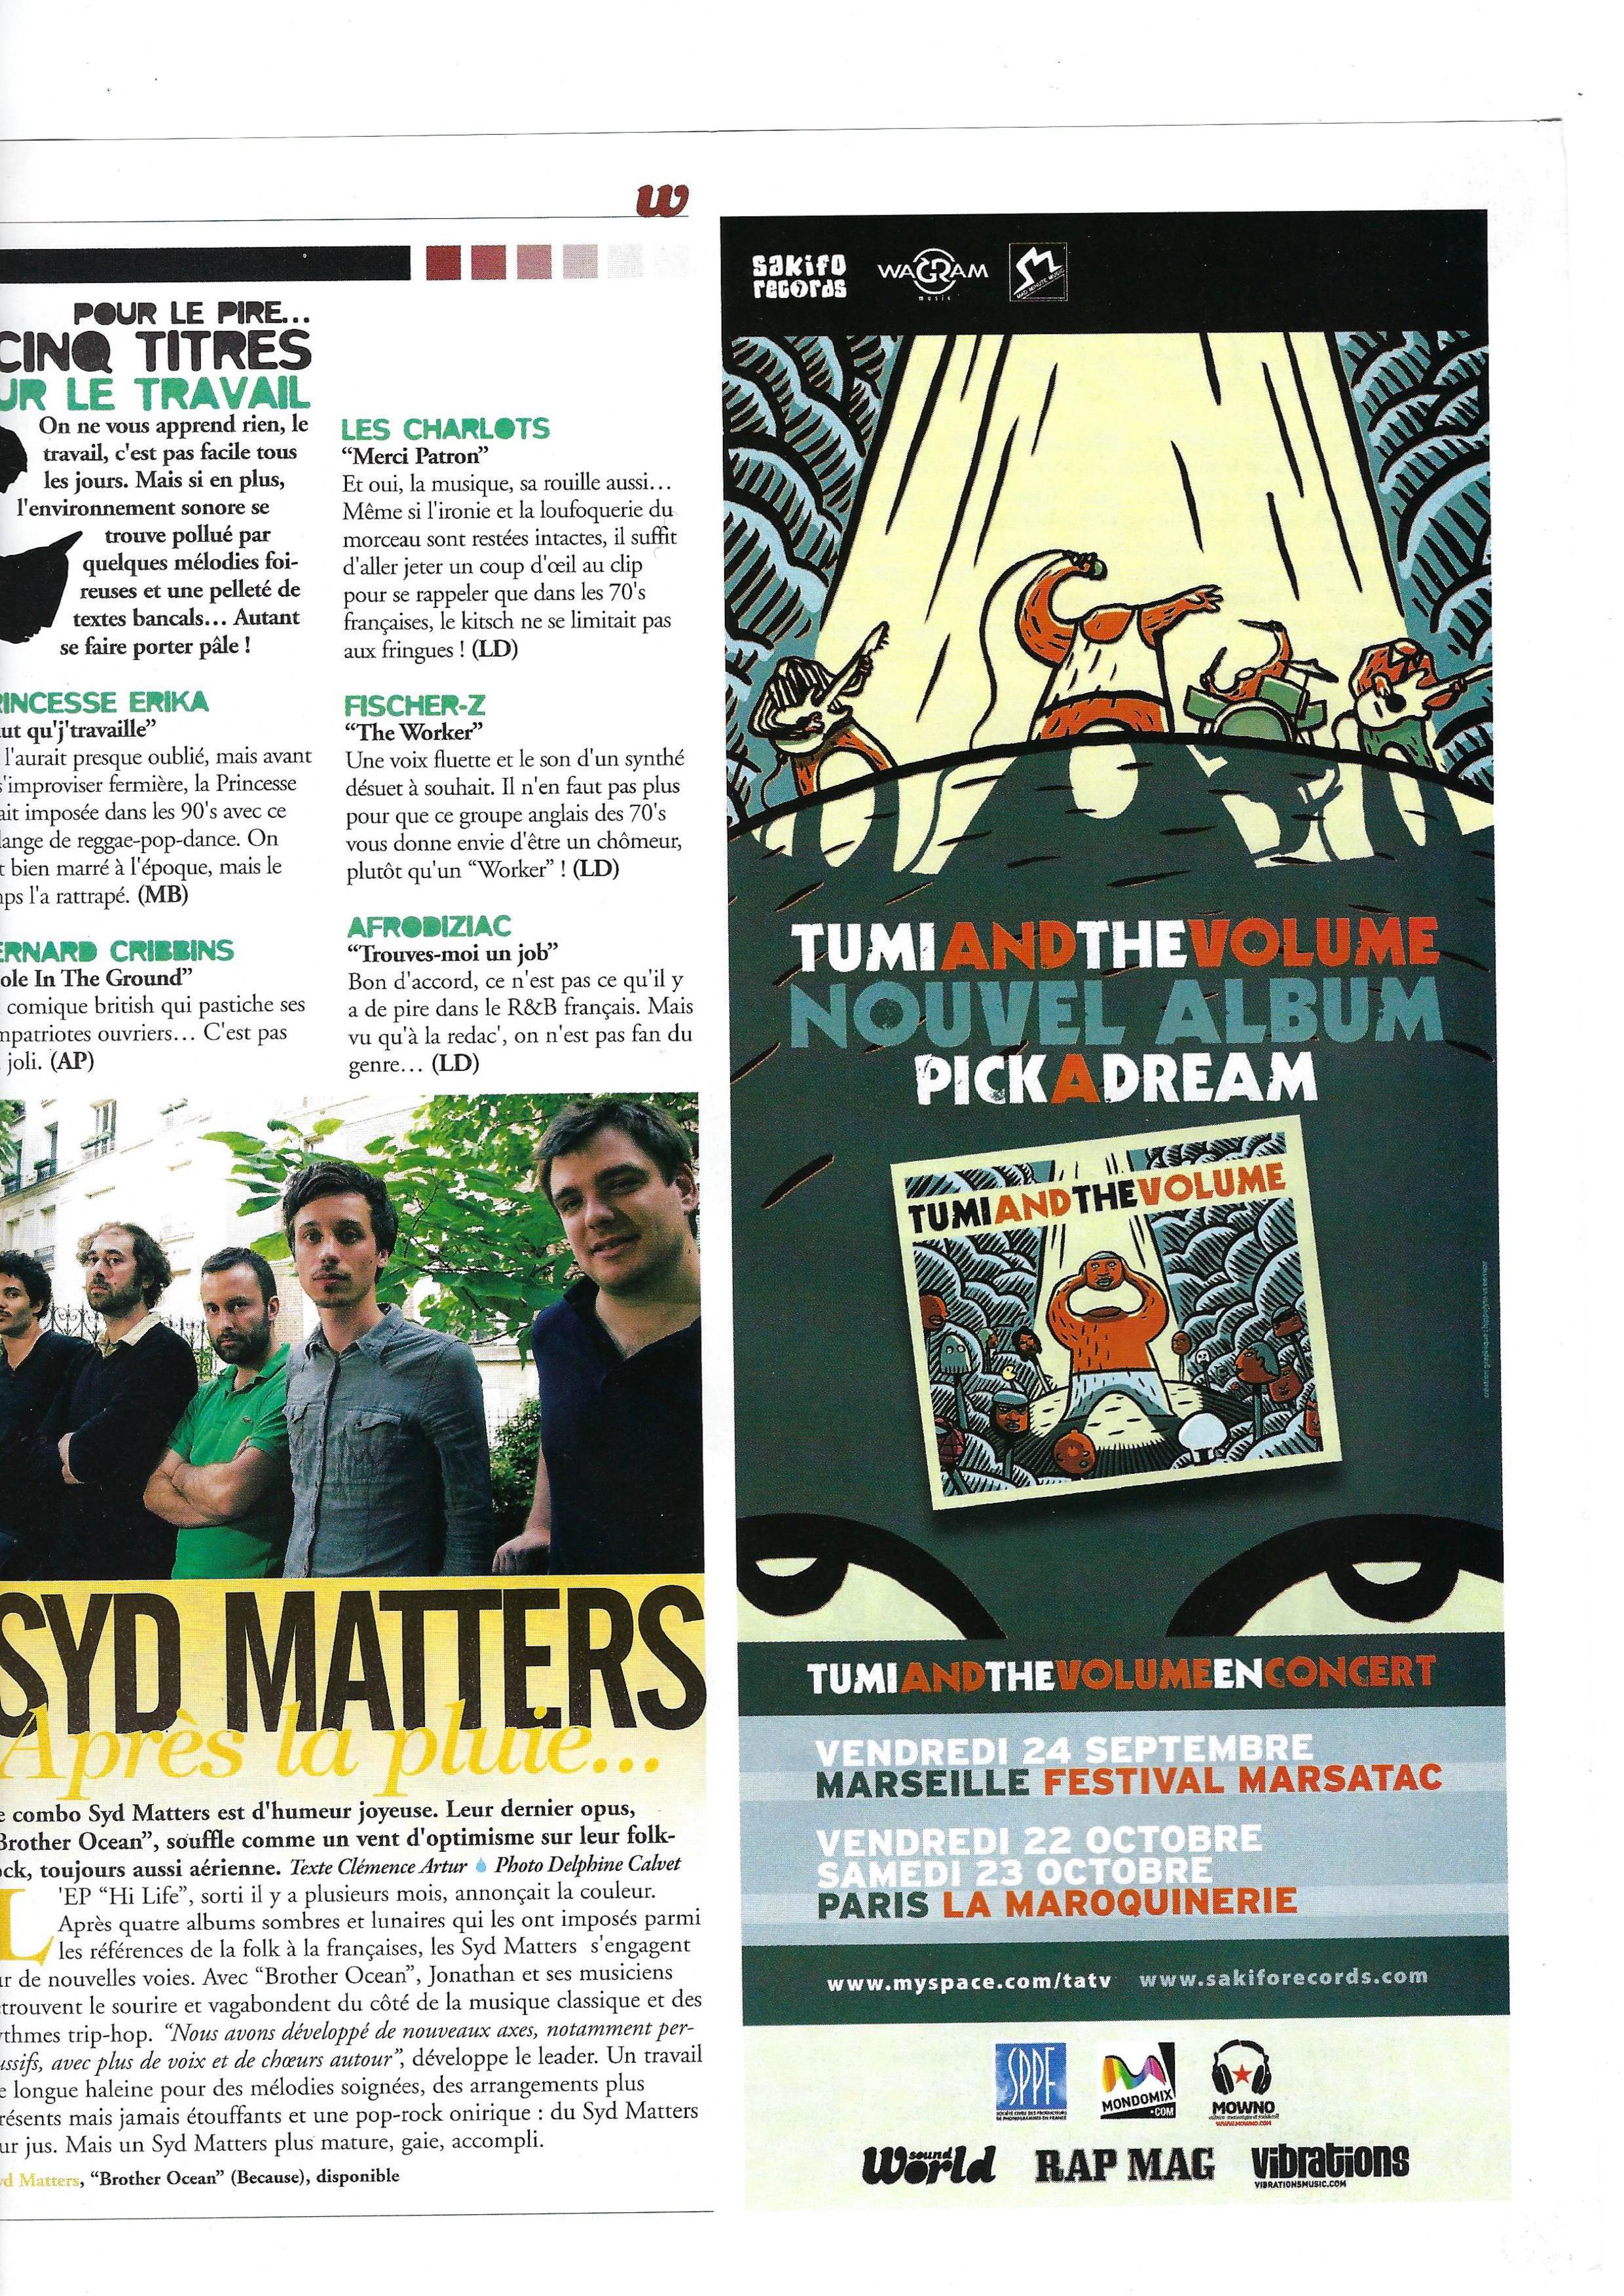 Syd Matters (World Sound)